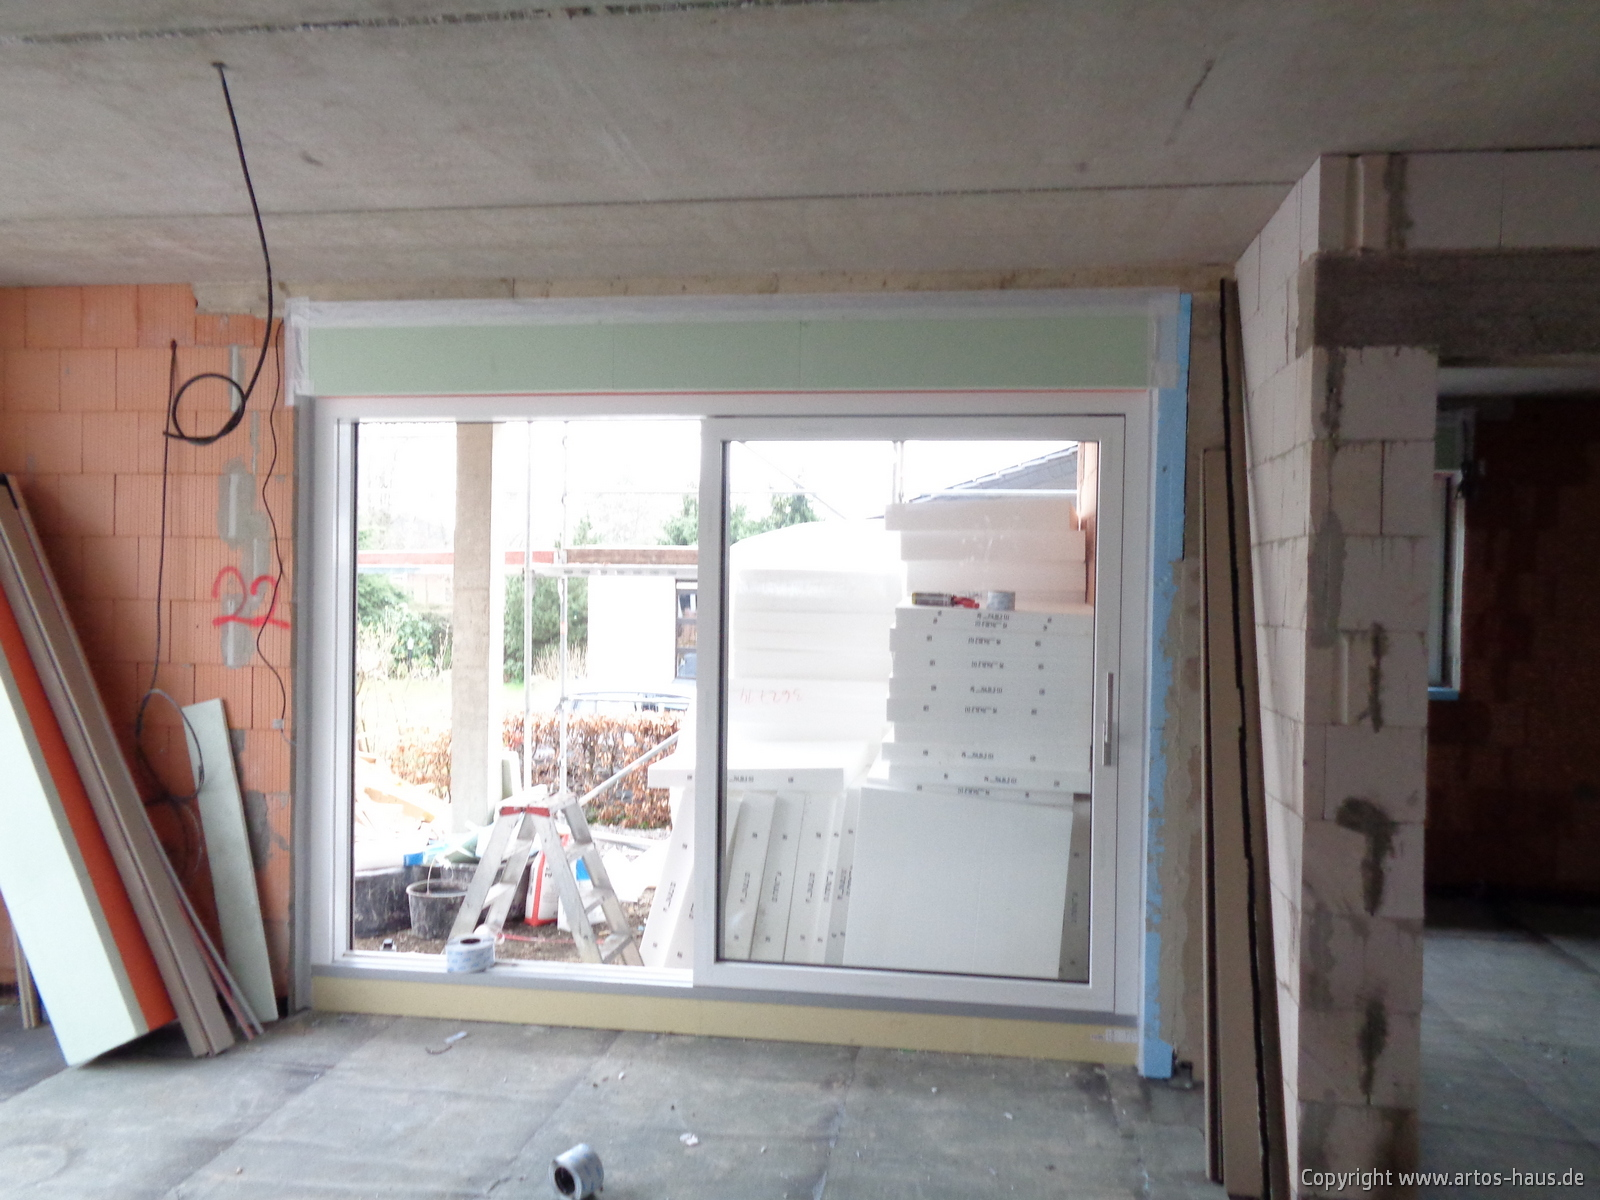 Fenstereinbau ARTOS HAUS 2021, Bild 2